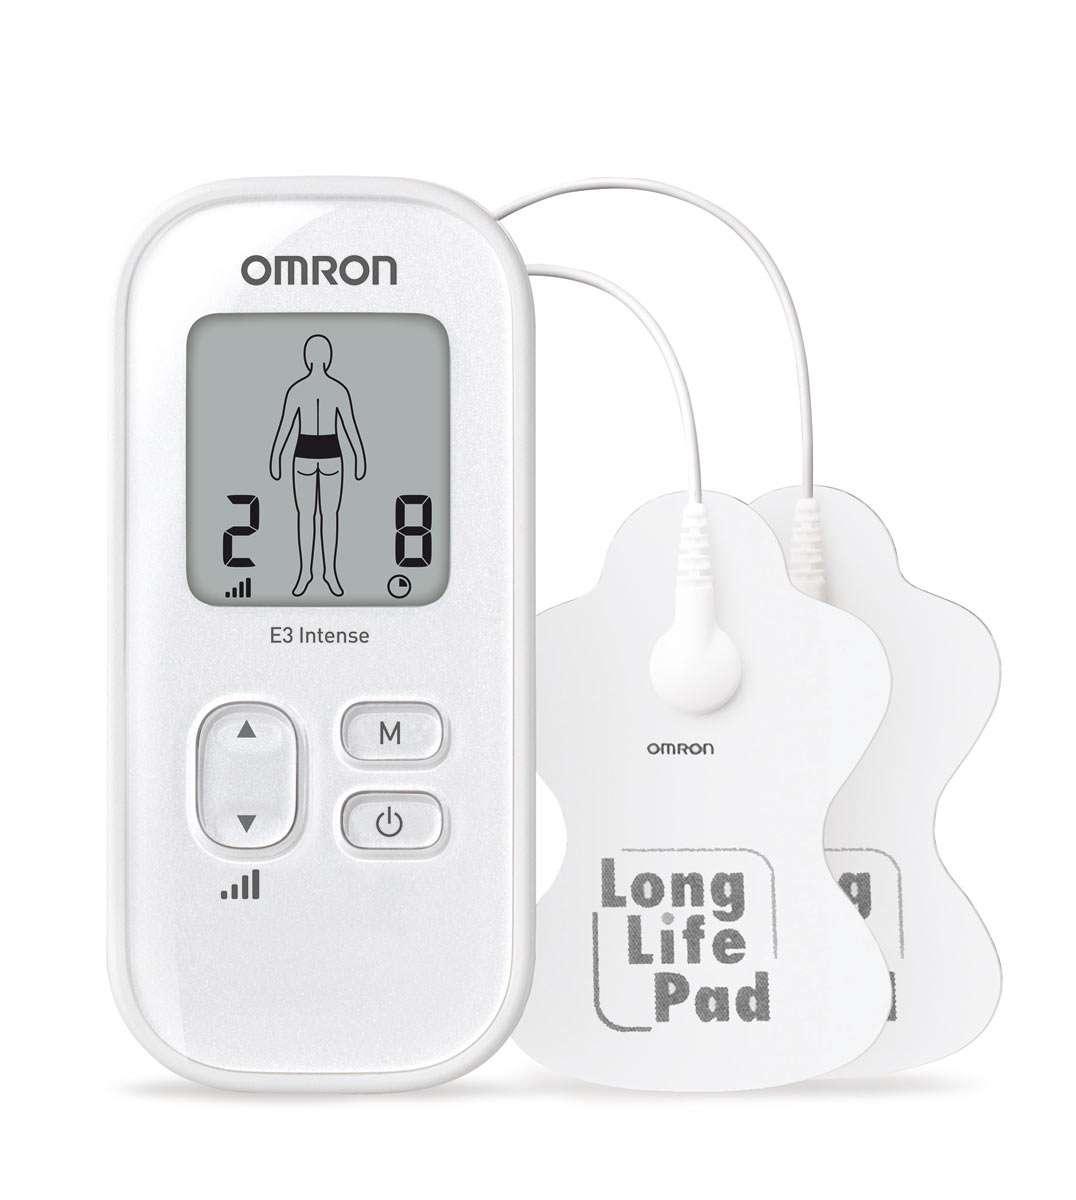 TENS-миостимулятор OMRON E3 INTENSE